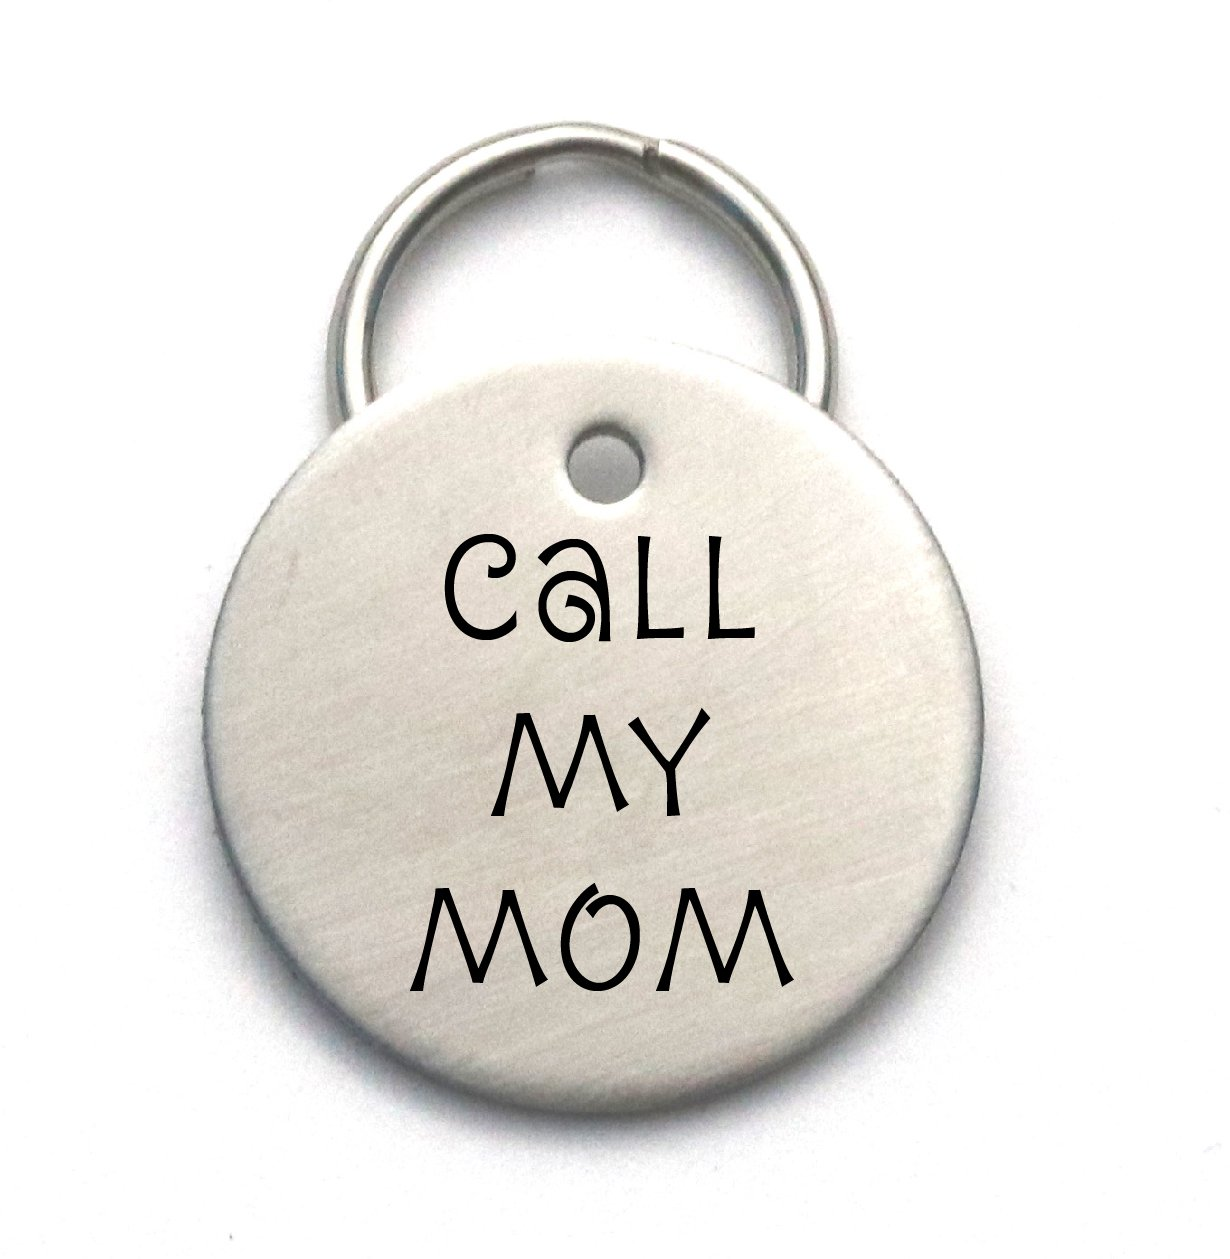 Call My Mom, Dad, or Mum - Customized Dog Tag